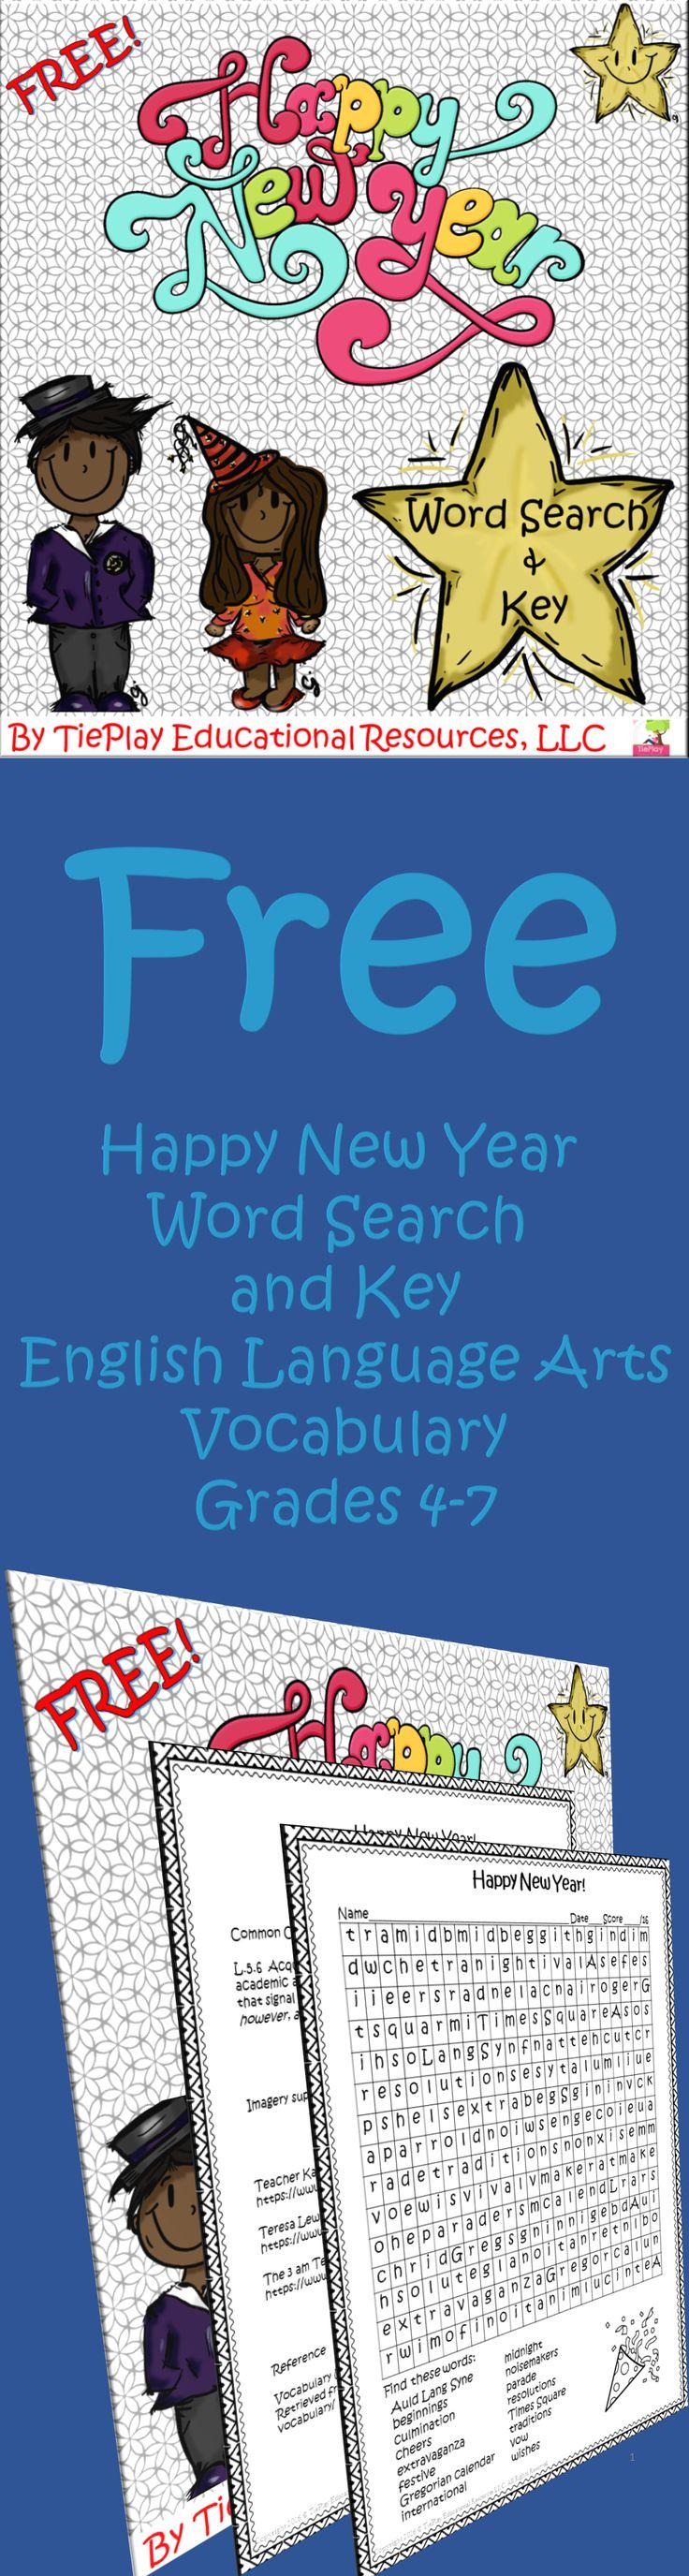 44 best Freebies images on Pinterest | Teacher freebies, Word search ...